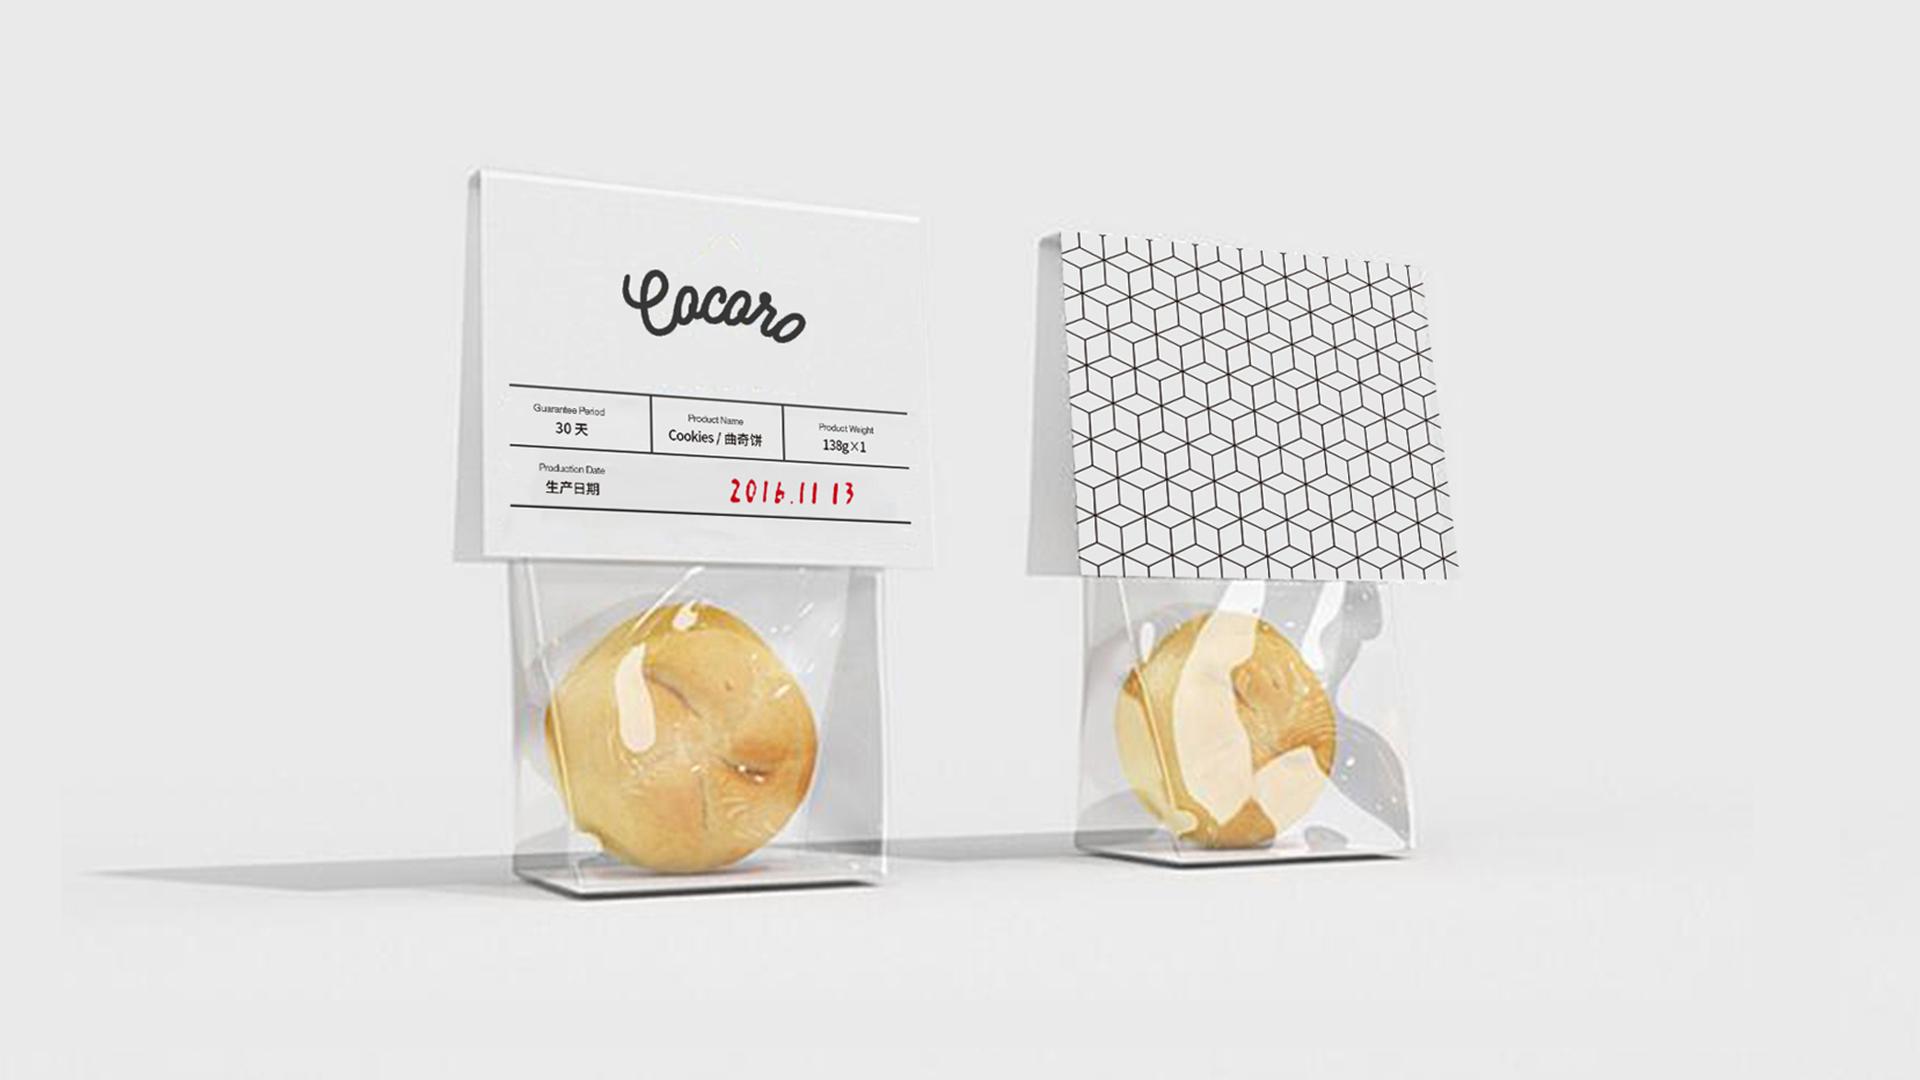 cocoro咖啡厅品牌包装设计-饼干袋设计